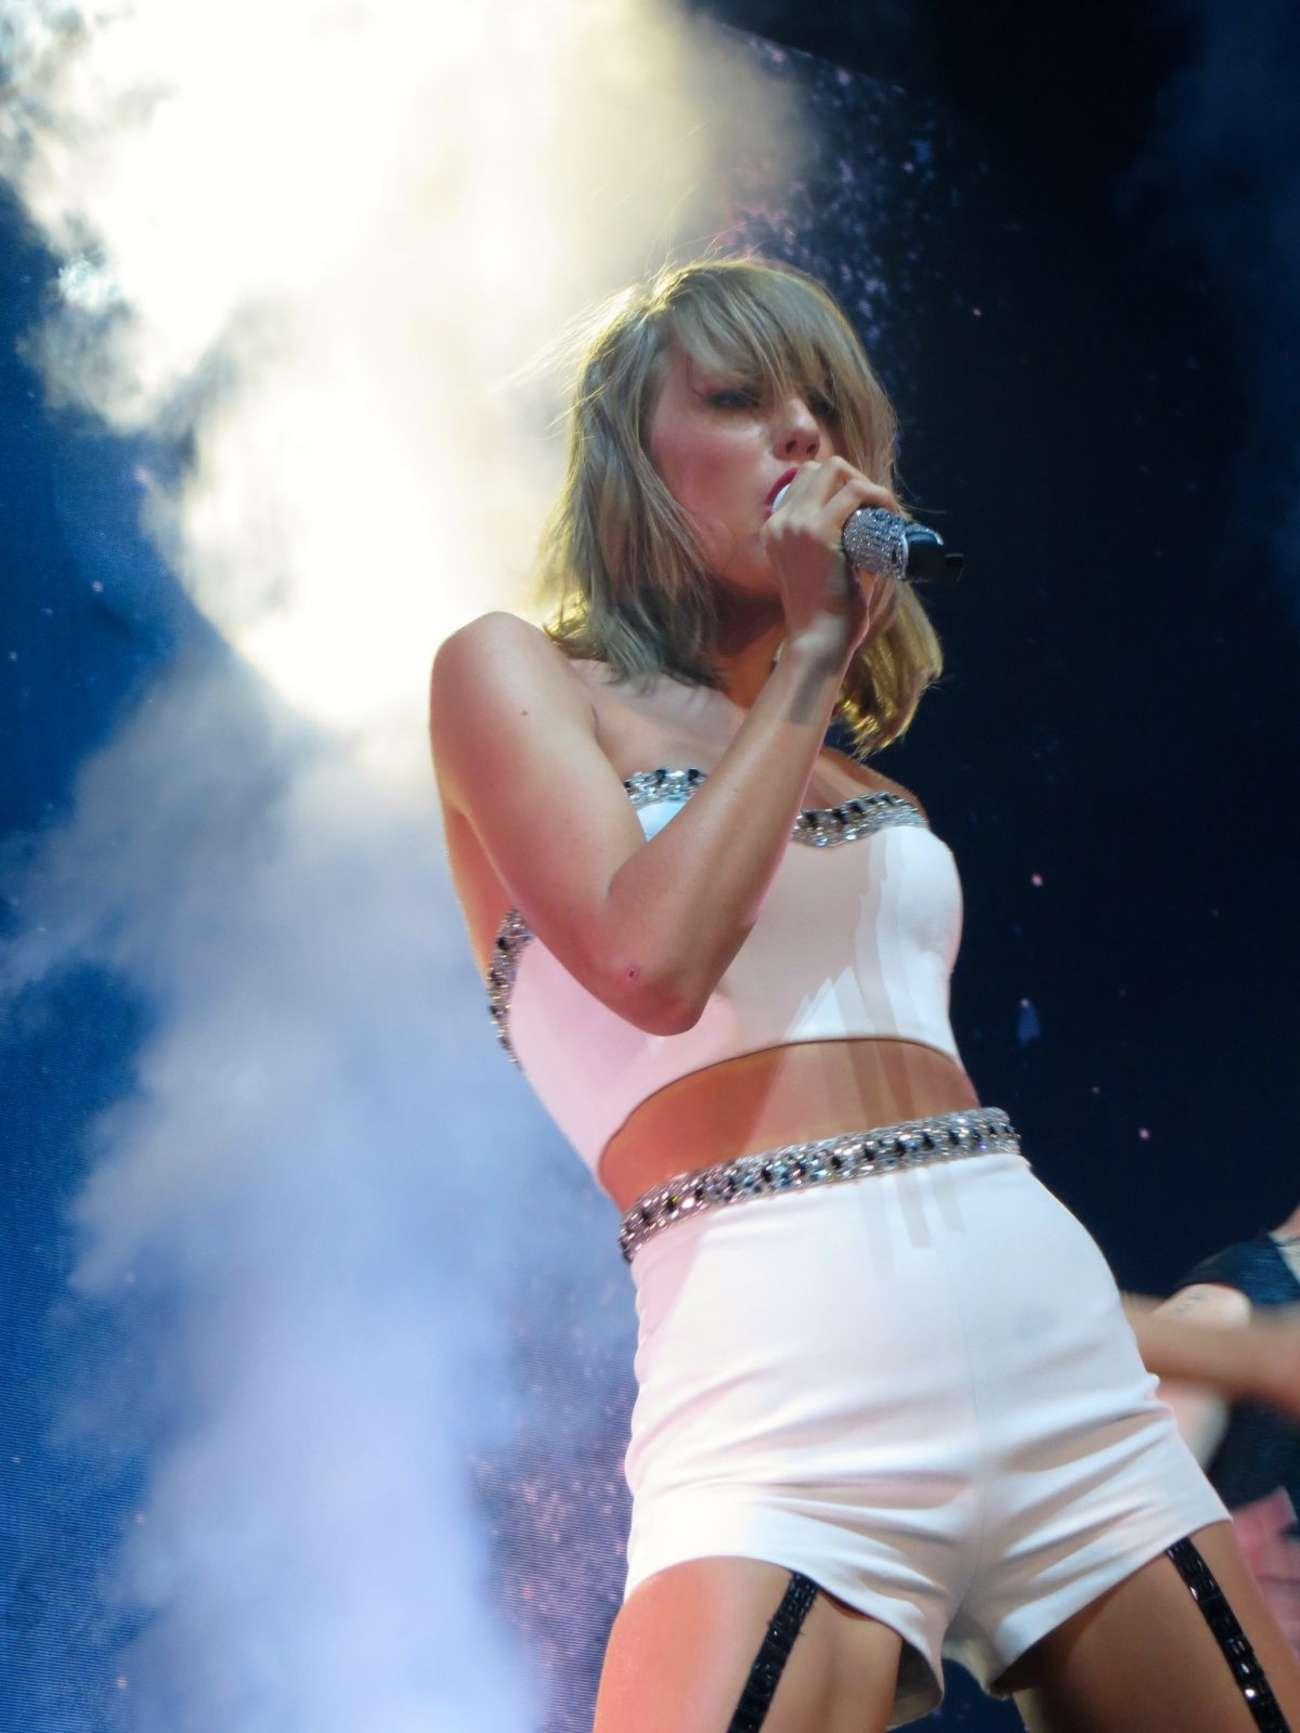 Taylor Swift 1989 World Tour In Glasgow